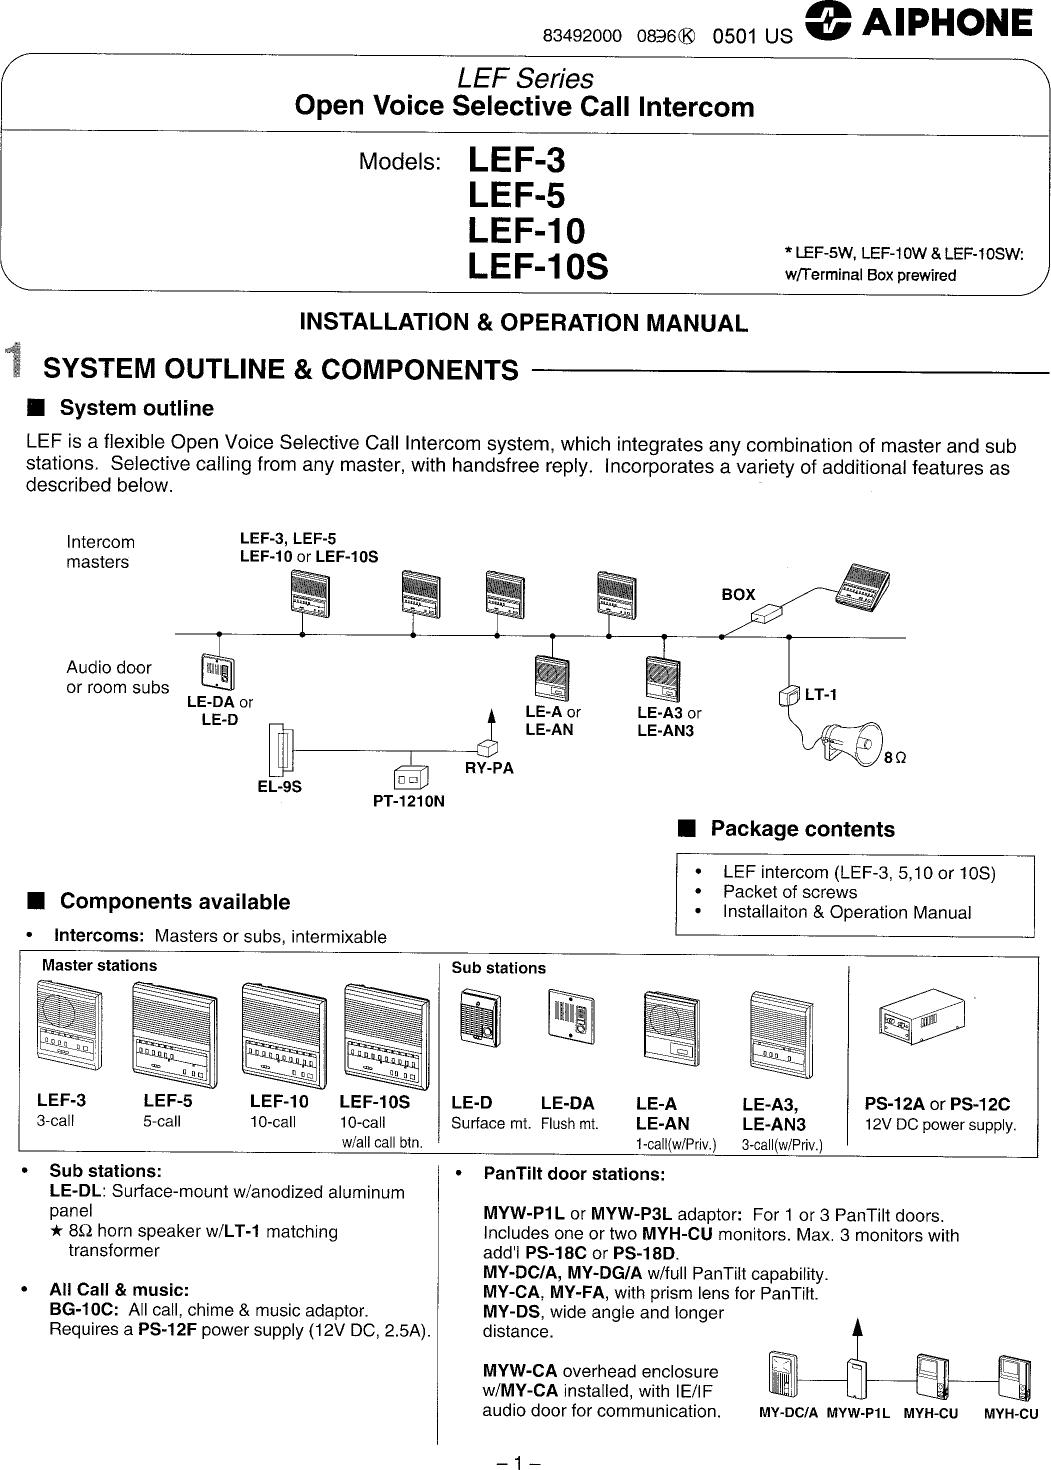 aiphone lef 10s user manual to the b7c459df 1ea2 4dab 9598 13ba76f2796d rh usermanual wiki Aiphone Lef 3 Wiring Diagram Aiphone JK Series